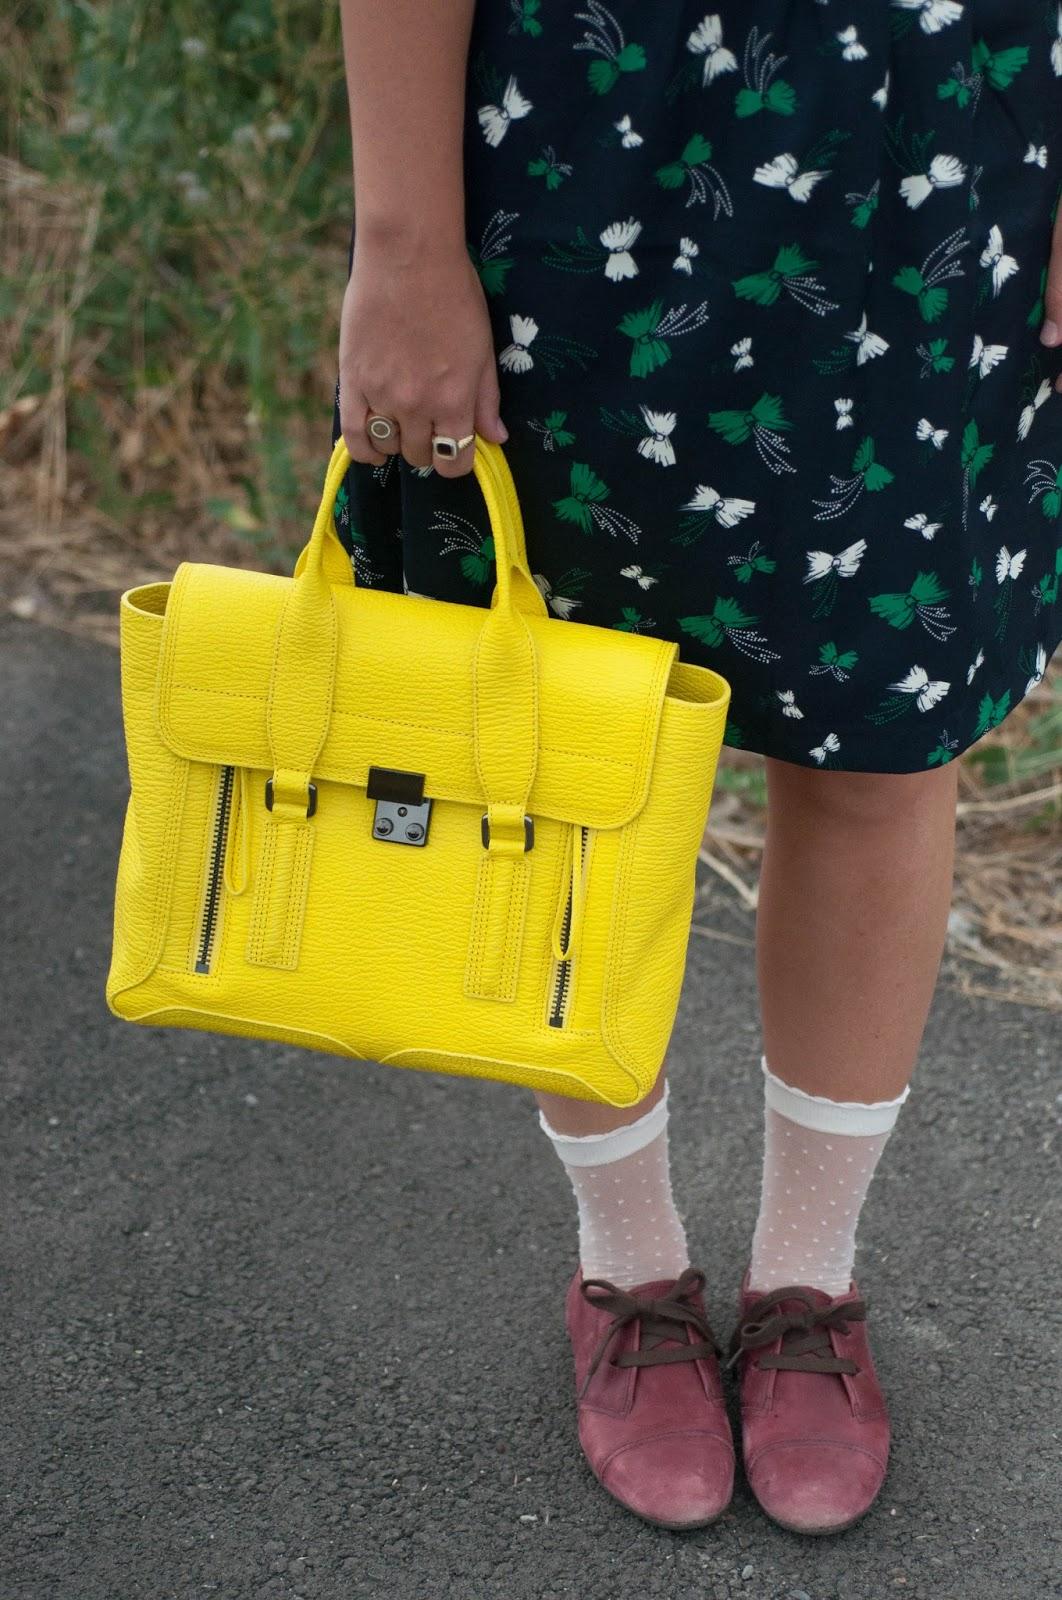 3.1 phillip lim, phillip lim pashli satchel, medium satchel, ootd, karen walker bow dress, nordstrom oxfords